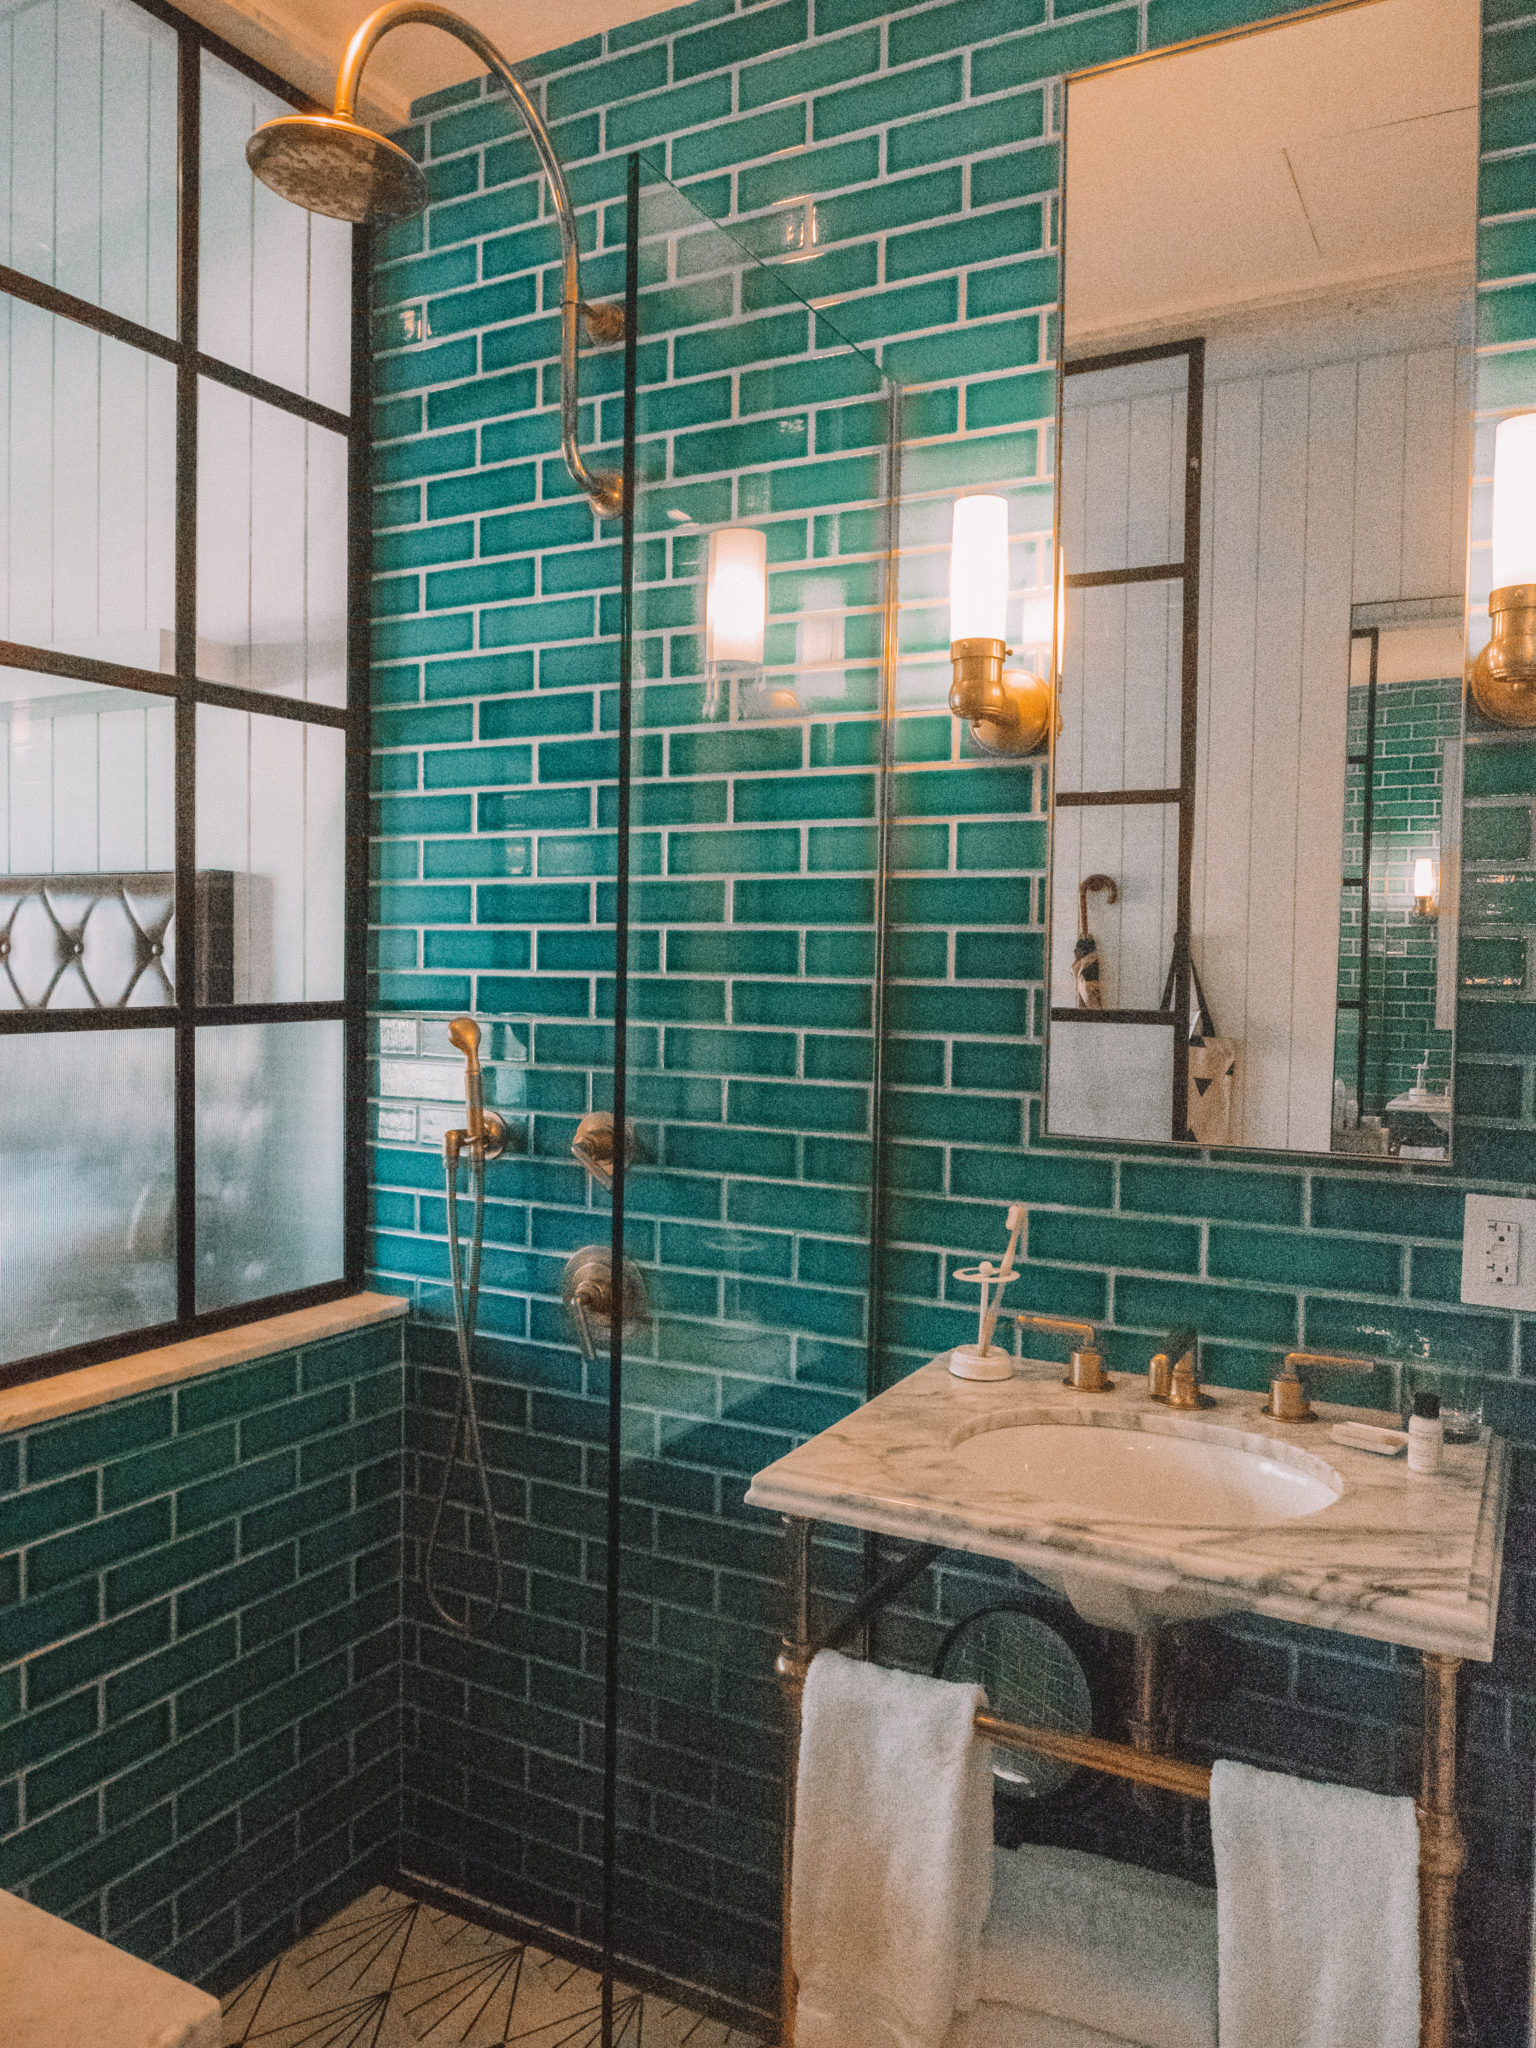 The Williamsburg Hotel NYC | WORLD OF WANDERLUST